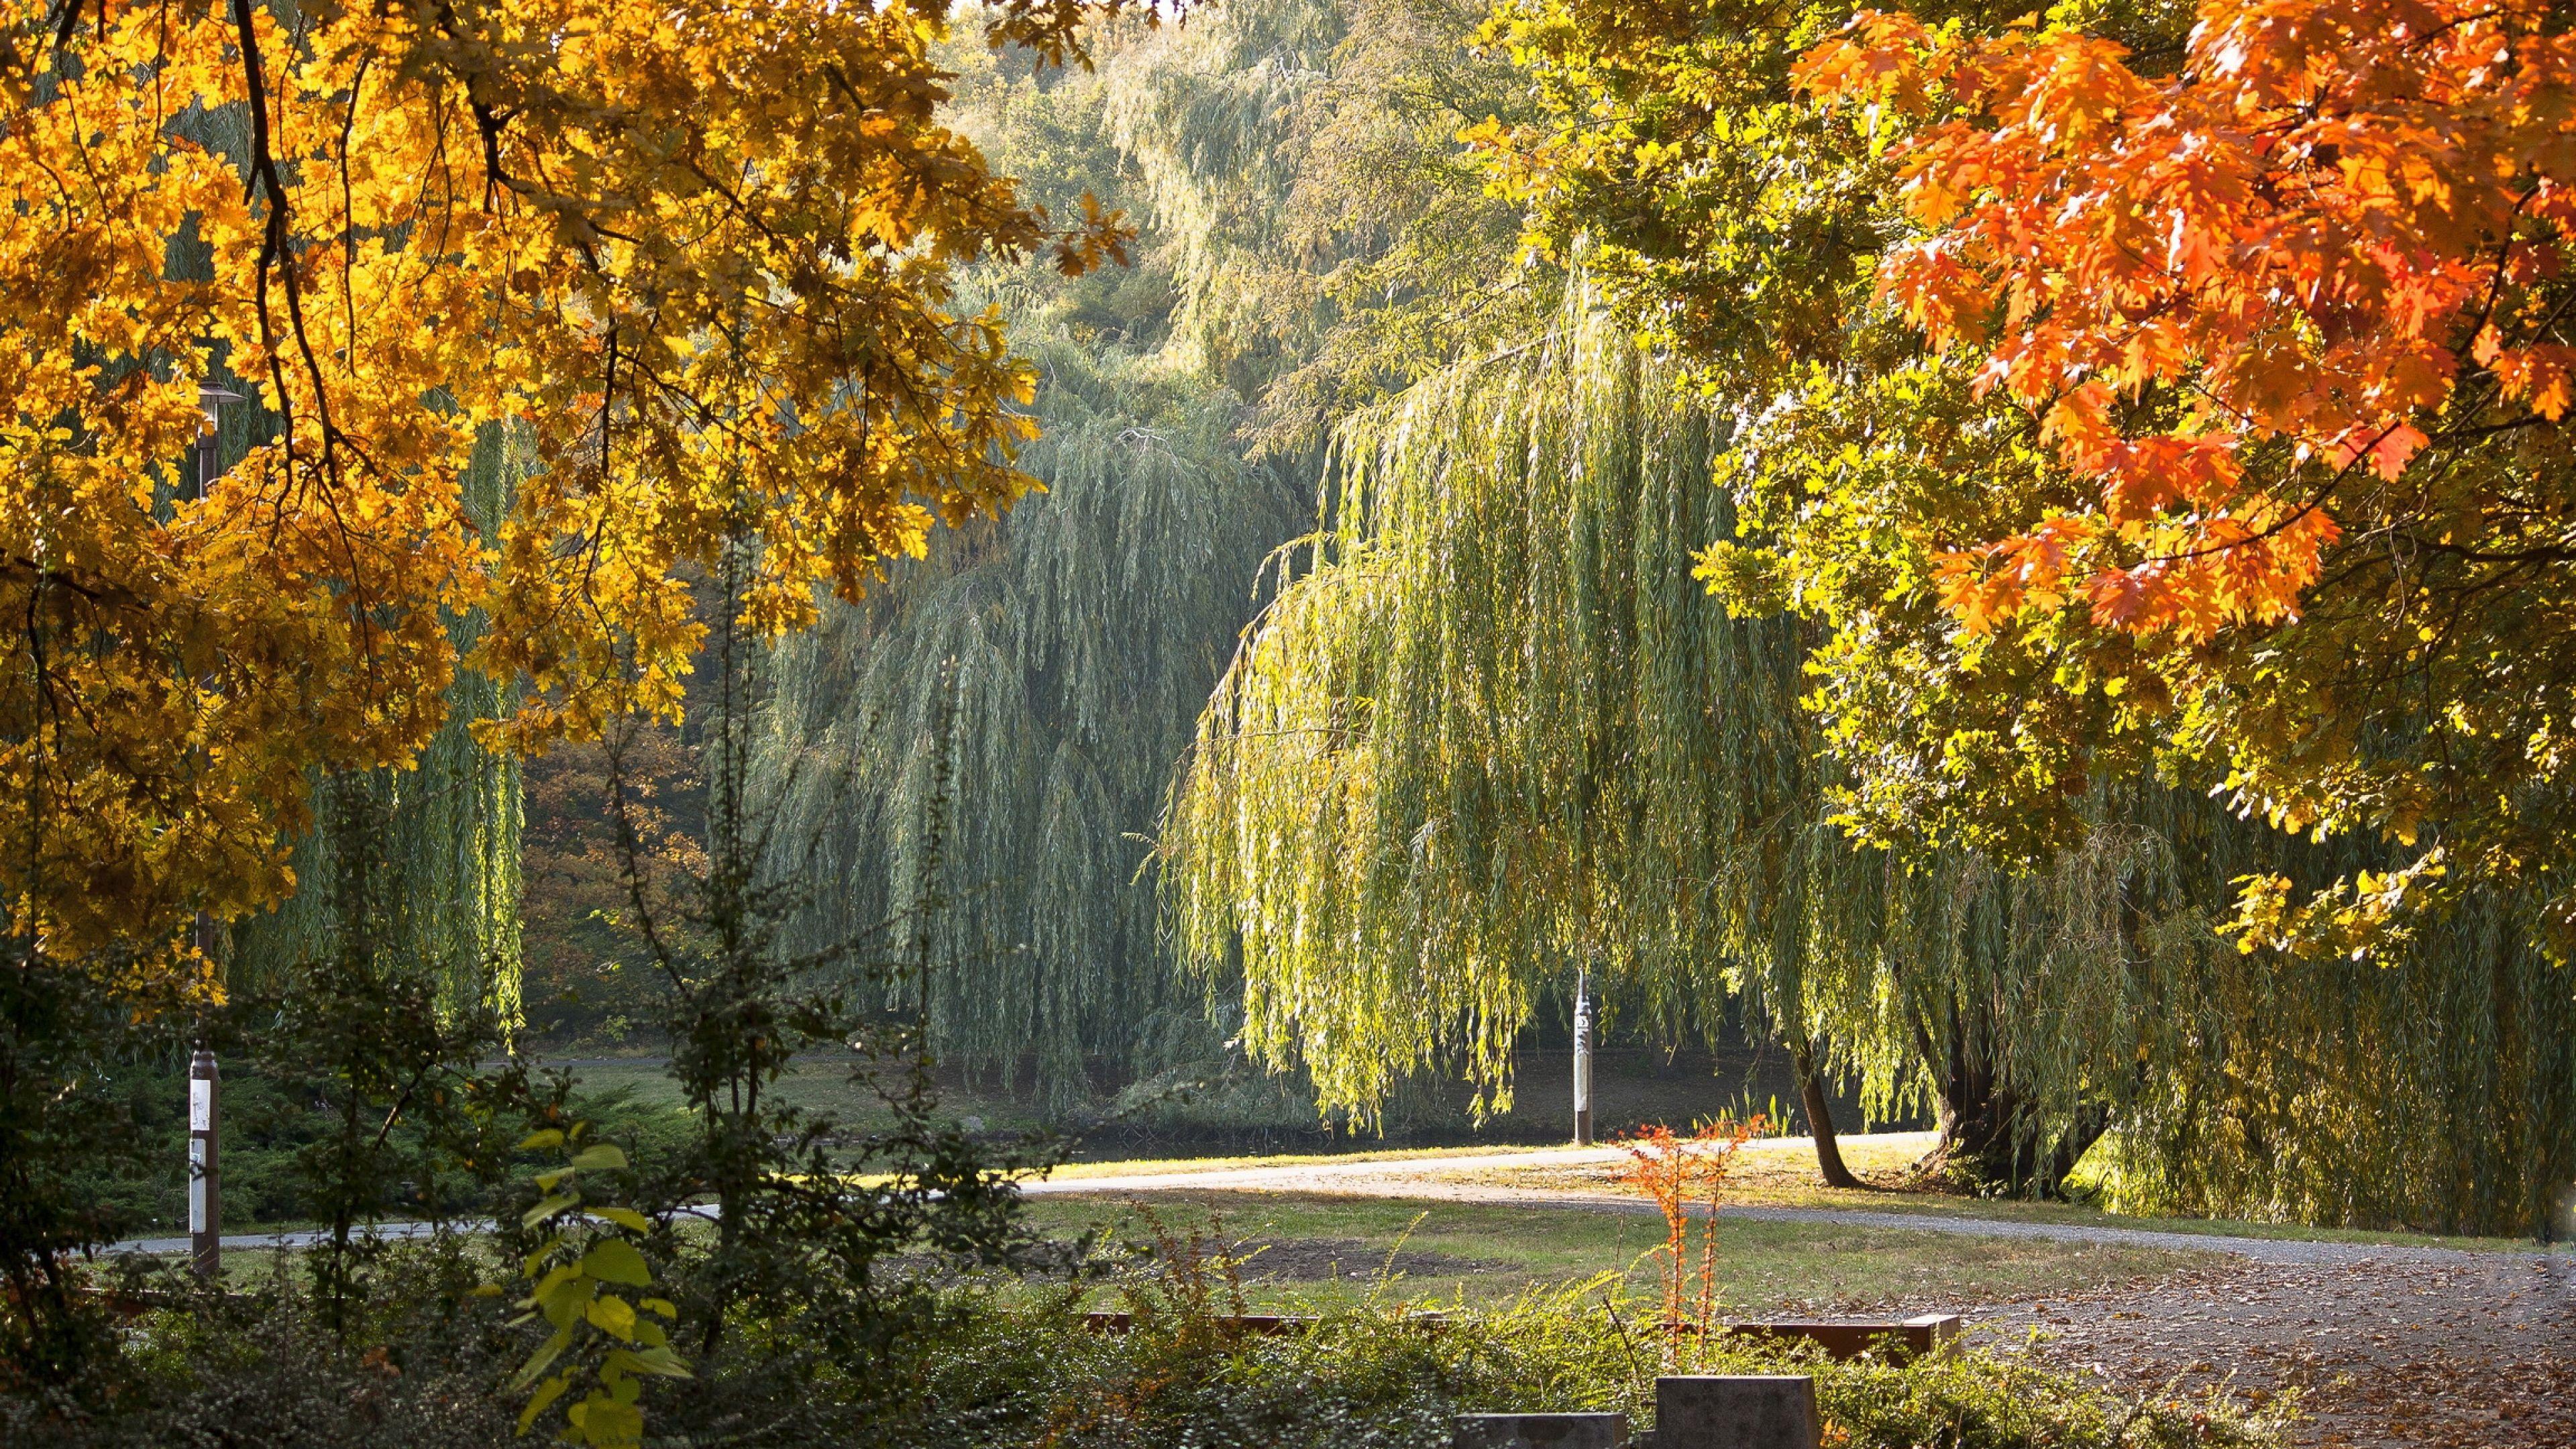 Download Wallpaper 3840x2160 Park Hungary Autumn Landscape 4k Ultra Hd Hd Background Nature Desktop Wallpaper Autumn Landscape Nature Wallpaper